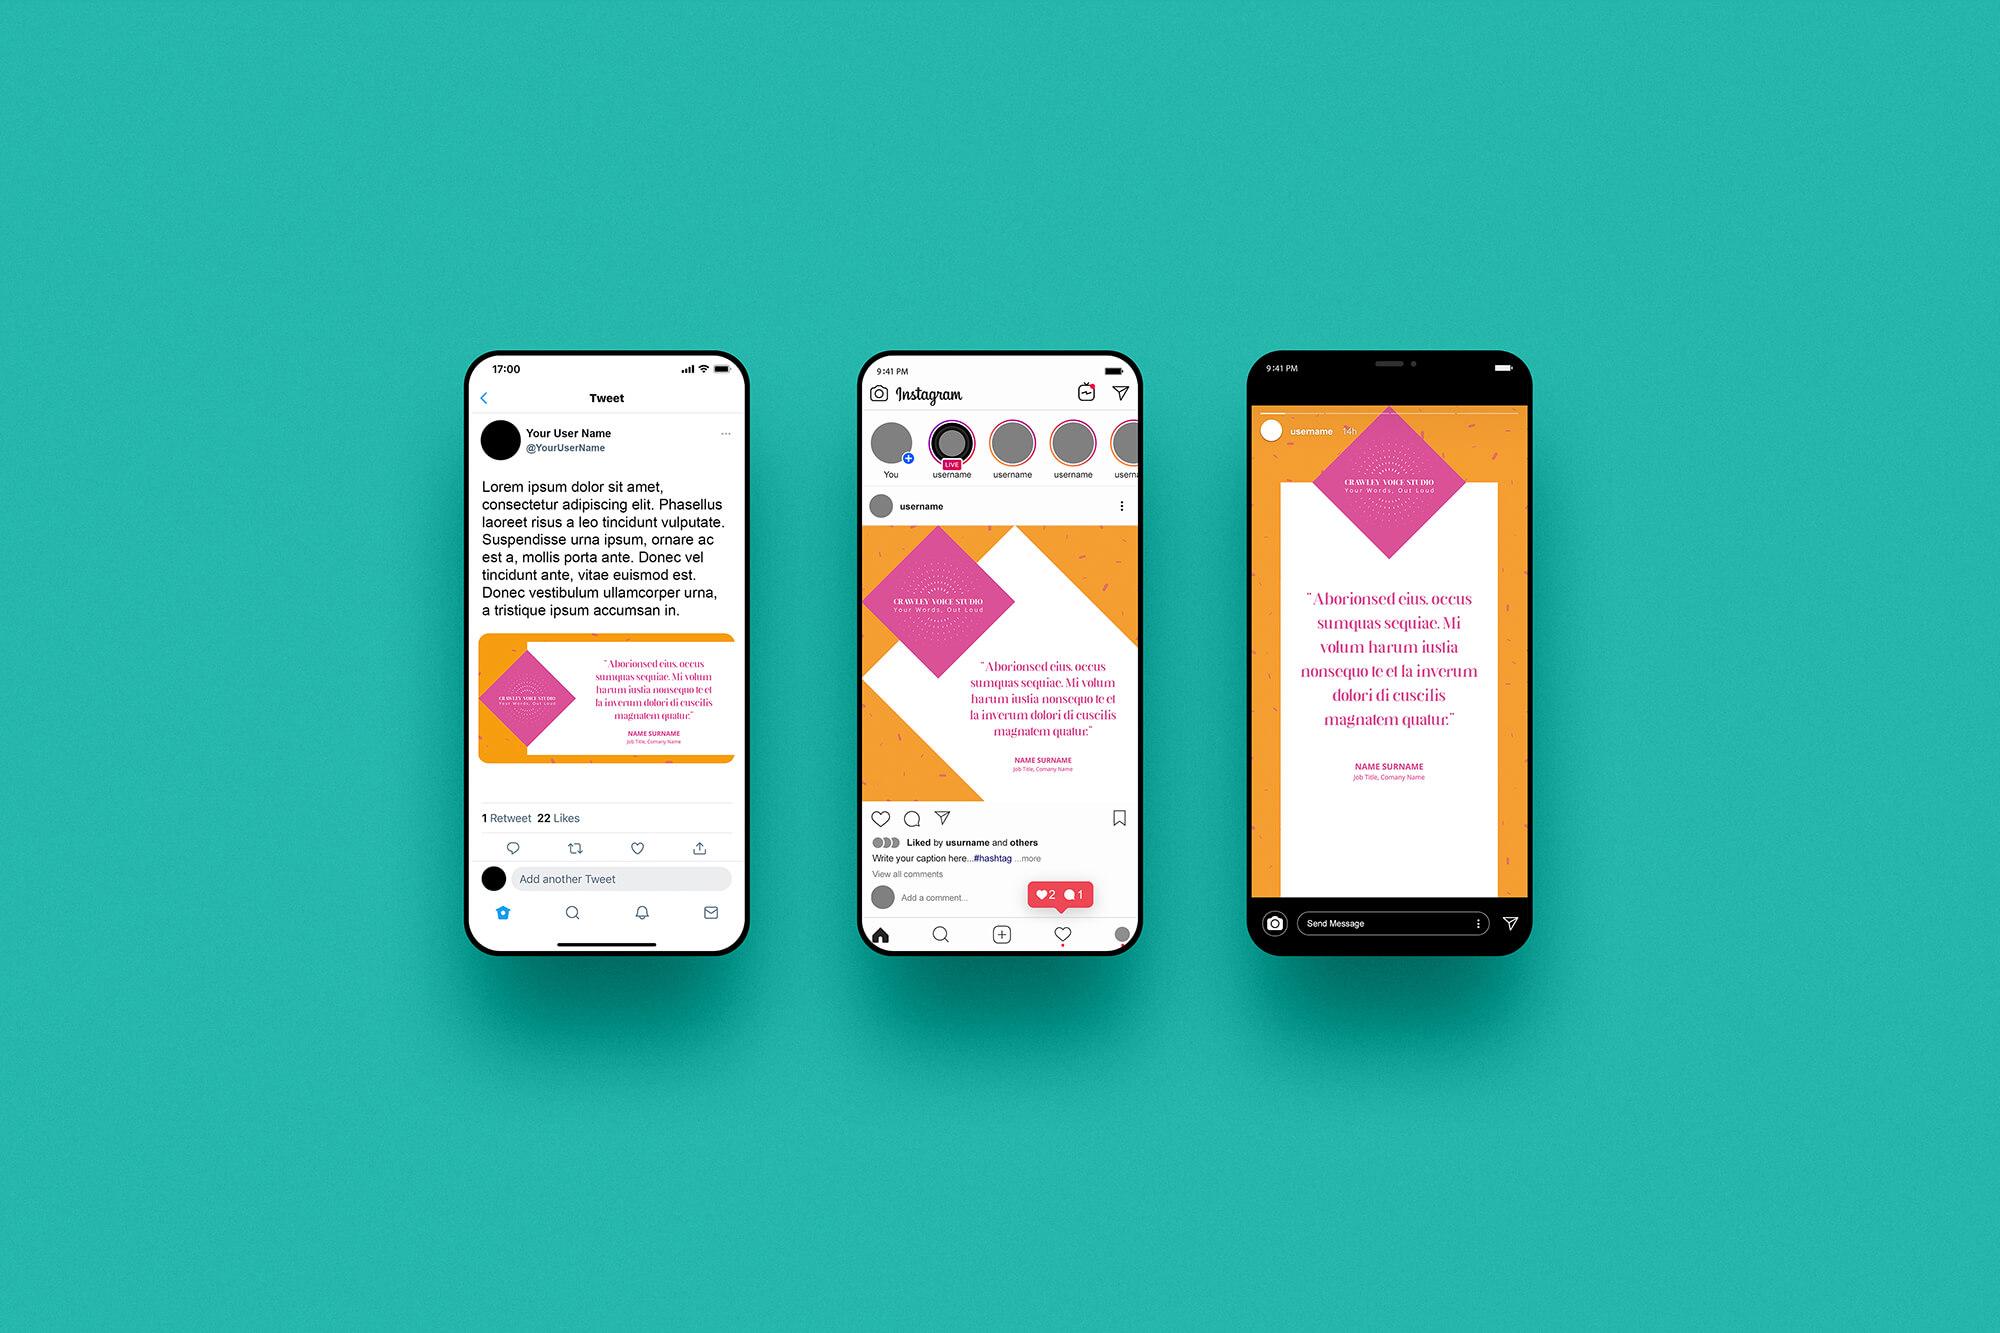 Crawley Voice Studio social media templates